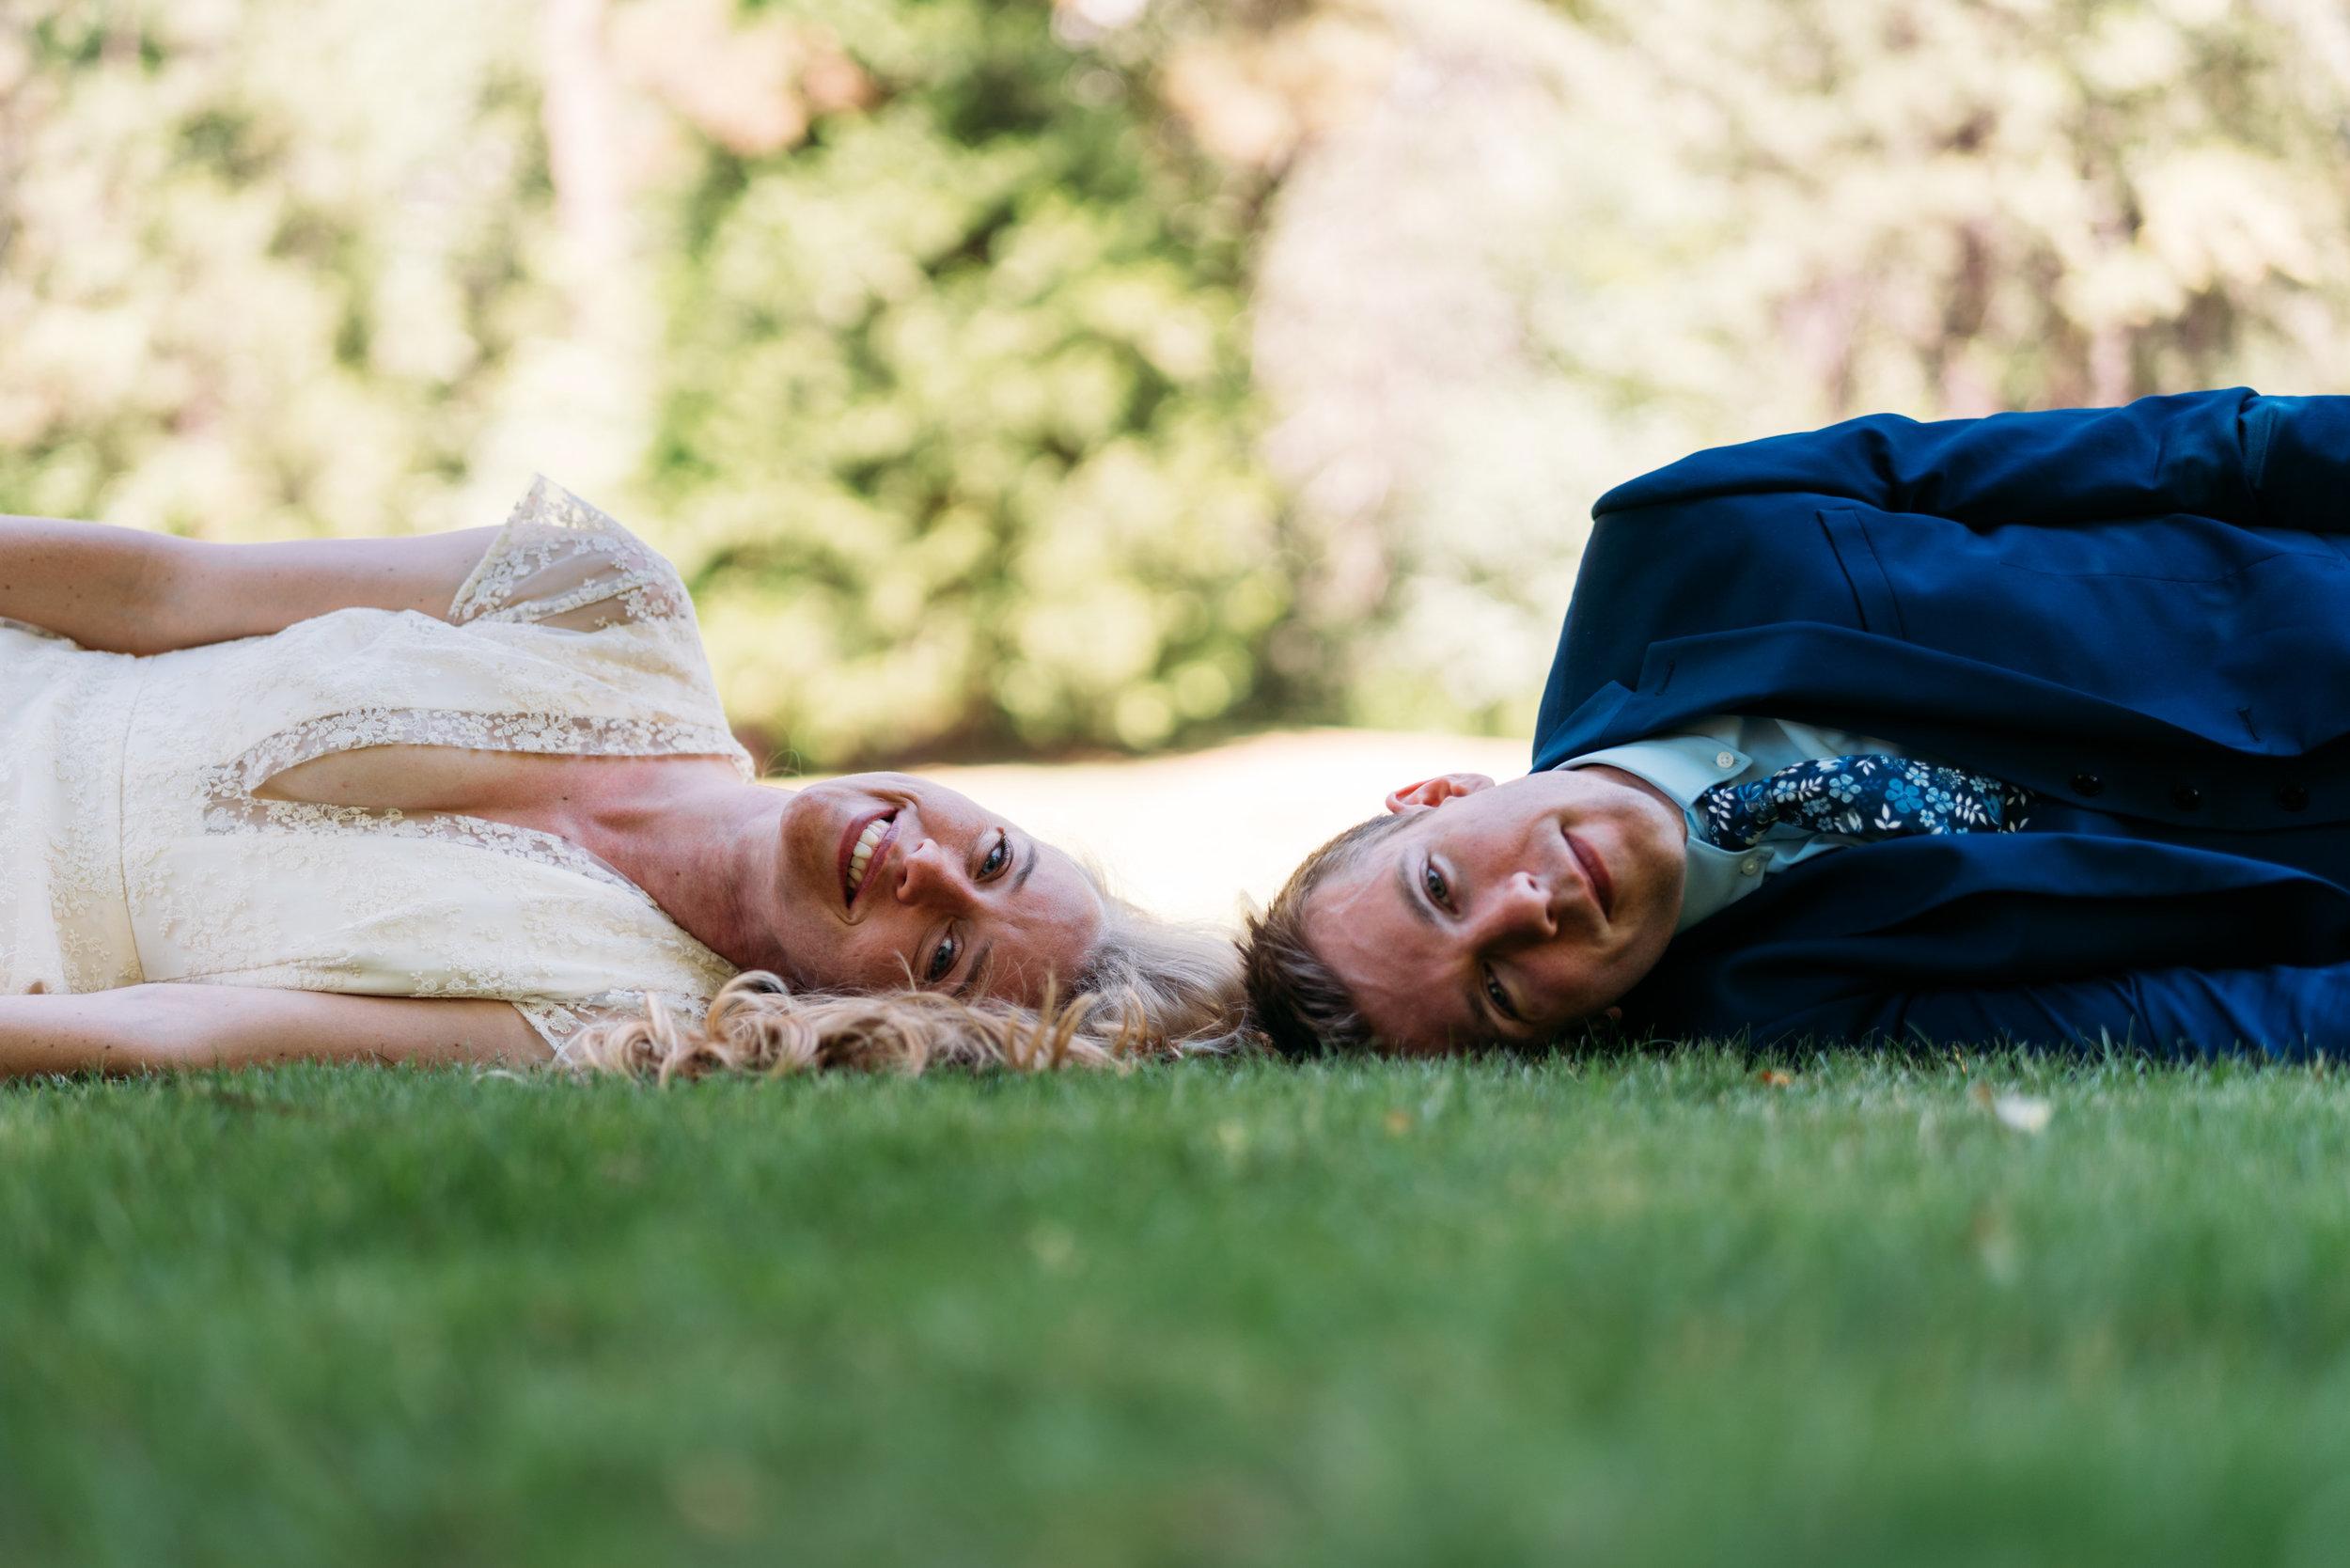 yosemite-wedding-photographer-1-4.jpg